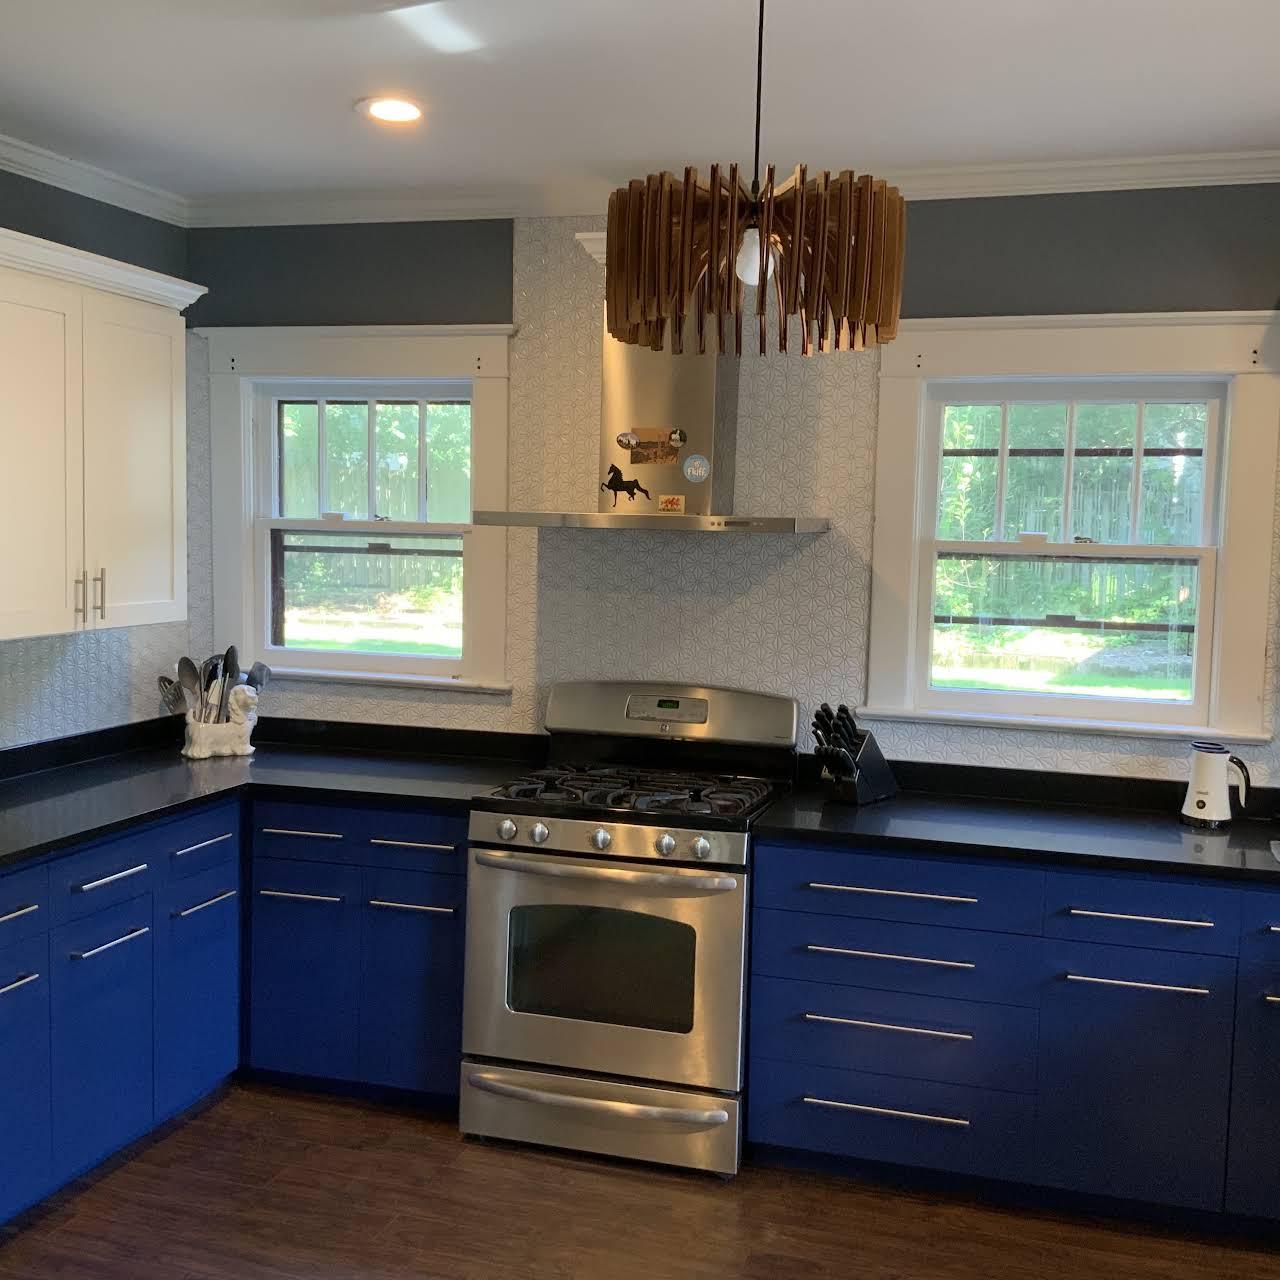 - Betts Designs Renovations - Bathroom Remodeler In Raleigh